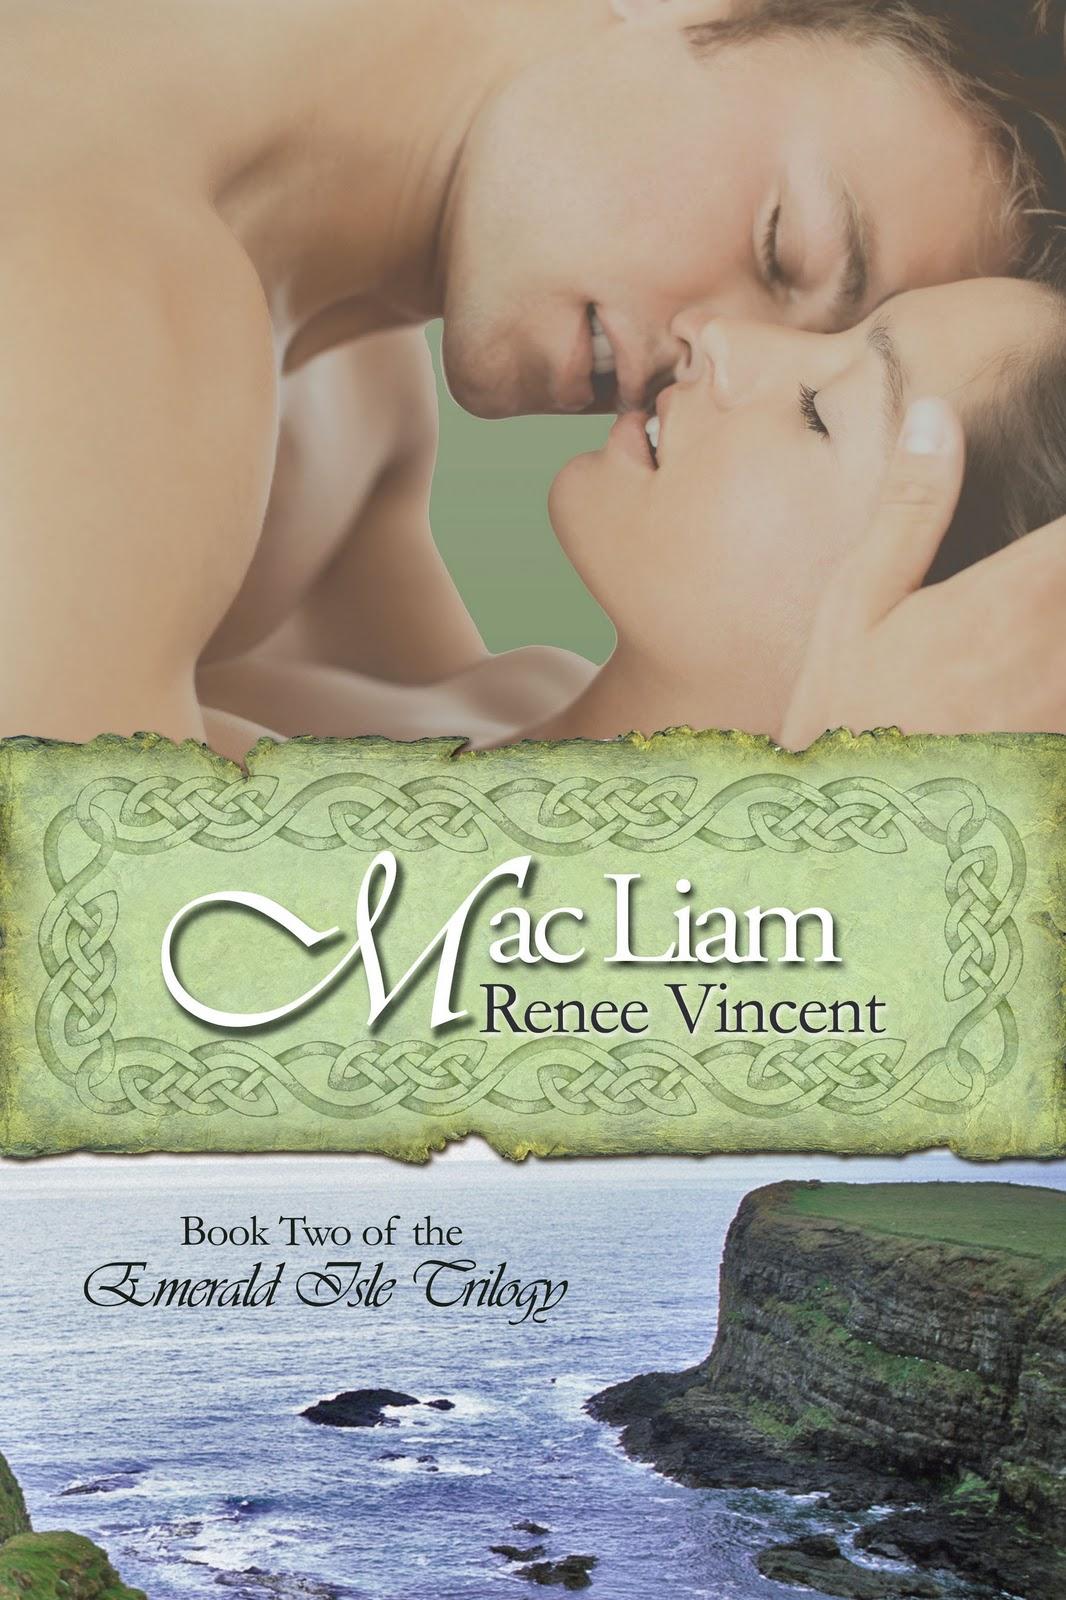 Mac Liam Final%2BRGB young teen homemade sex movie